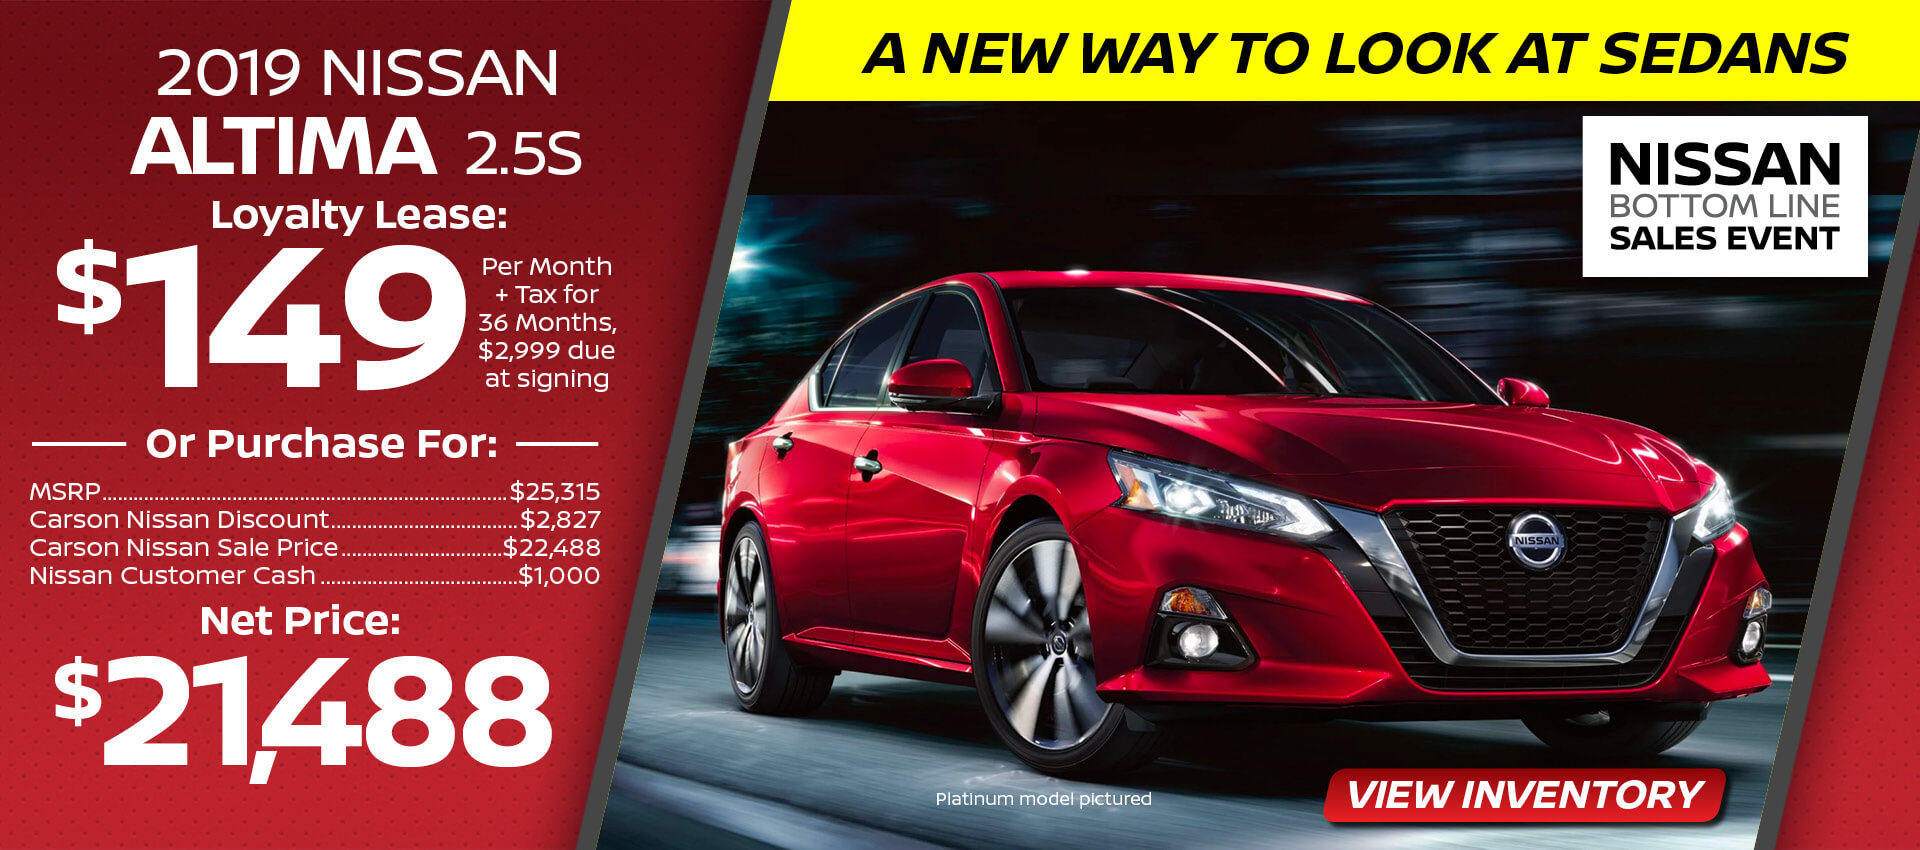 Nissan Dealership Los Angeles >> Nissan Dealership Los Angeles 2020 Upcoming Car Release